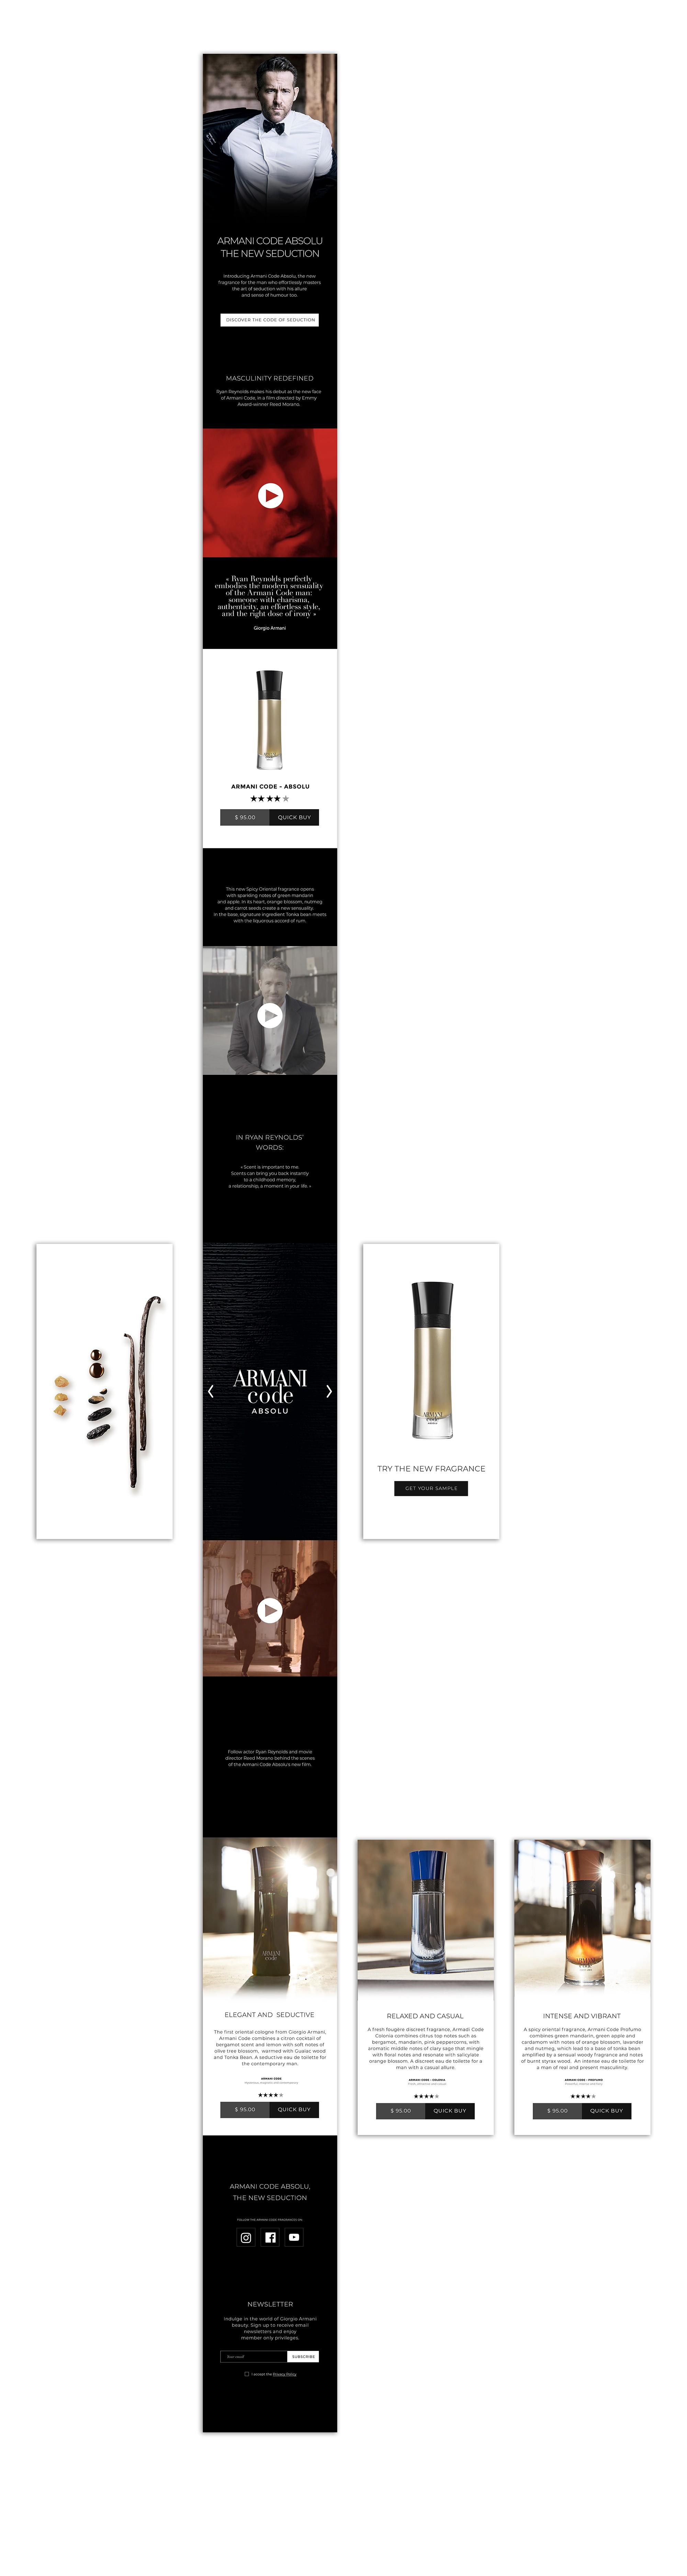 Landing-page-ARMANI-mobile